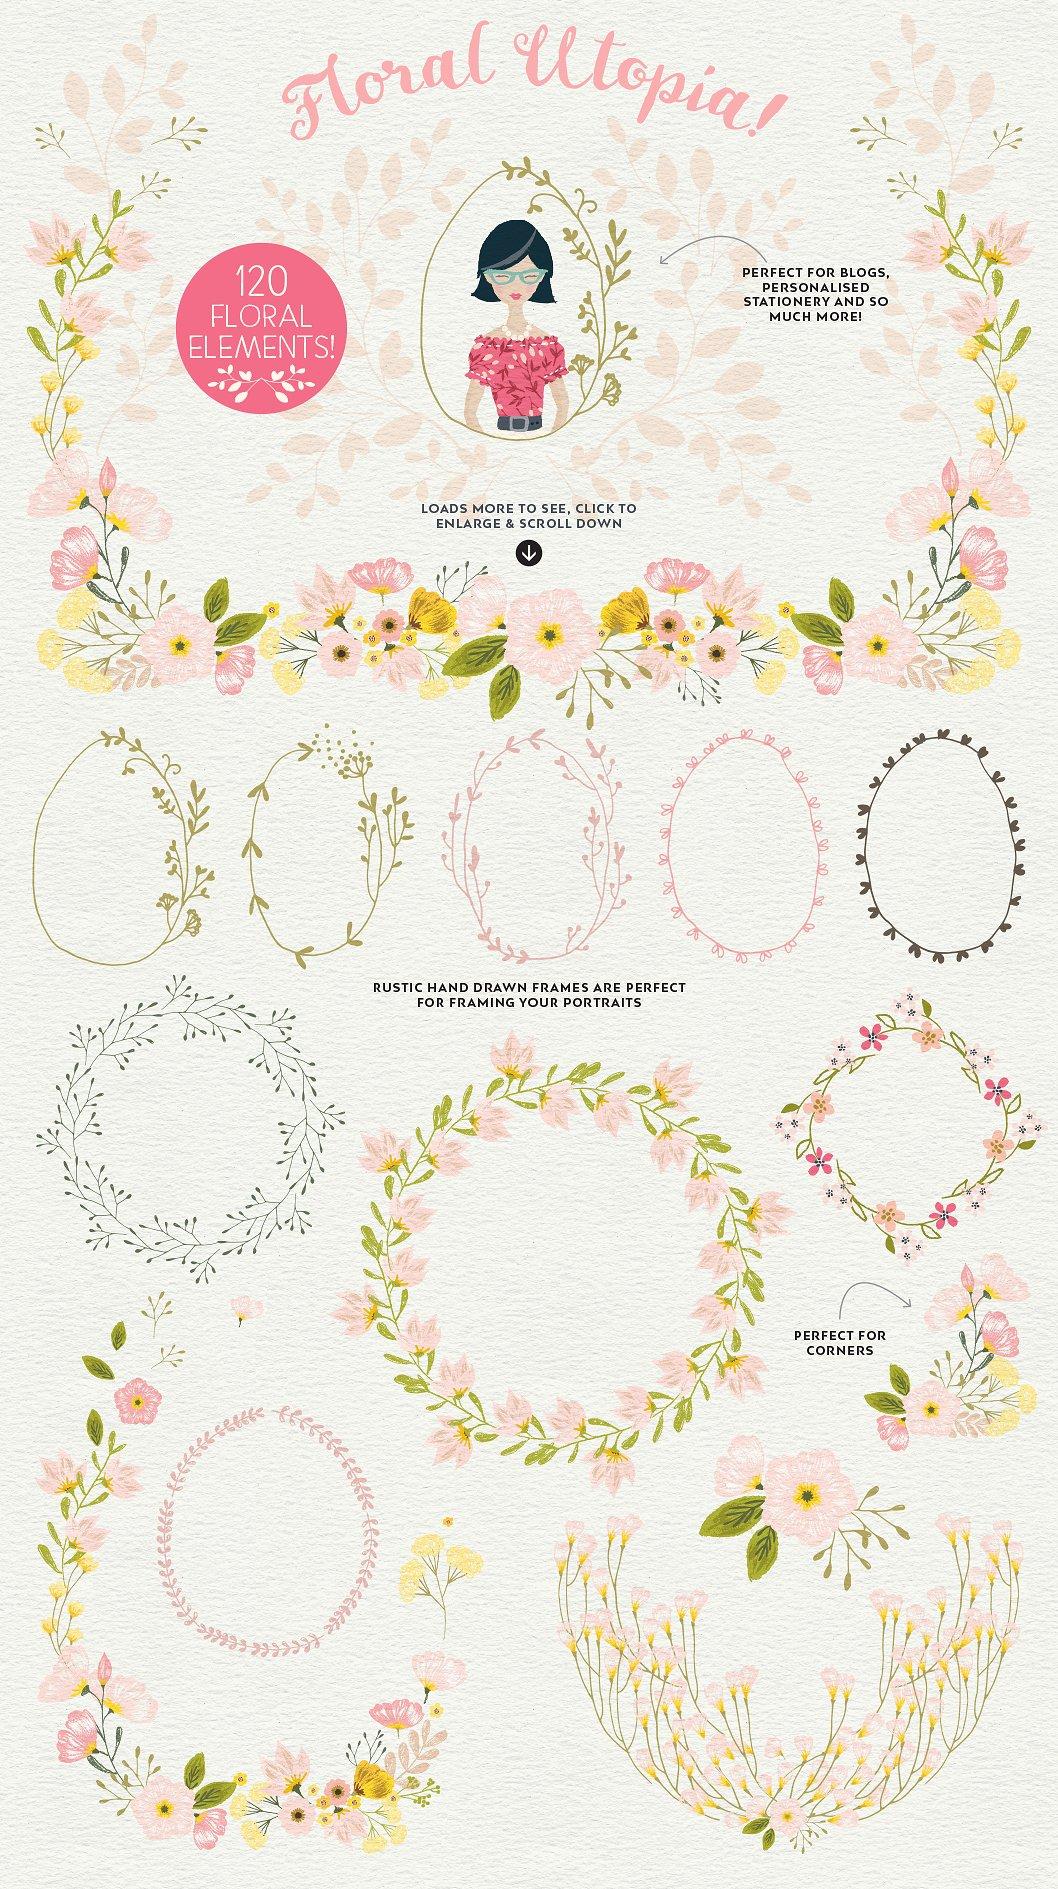 Floral Design Elements in Portrait Creator